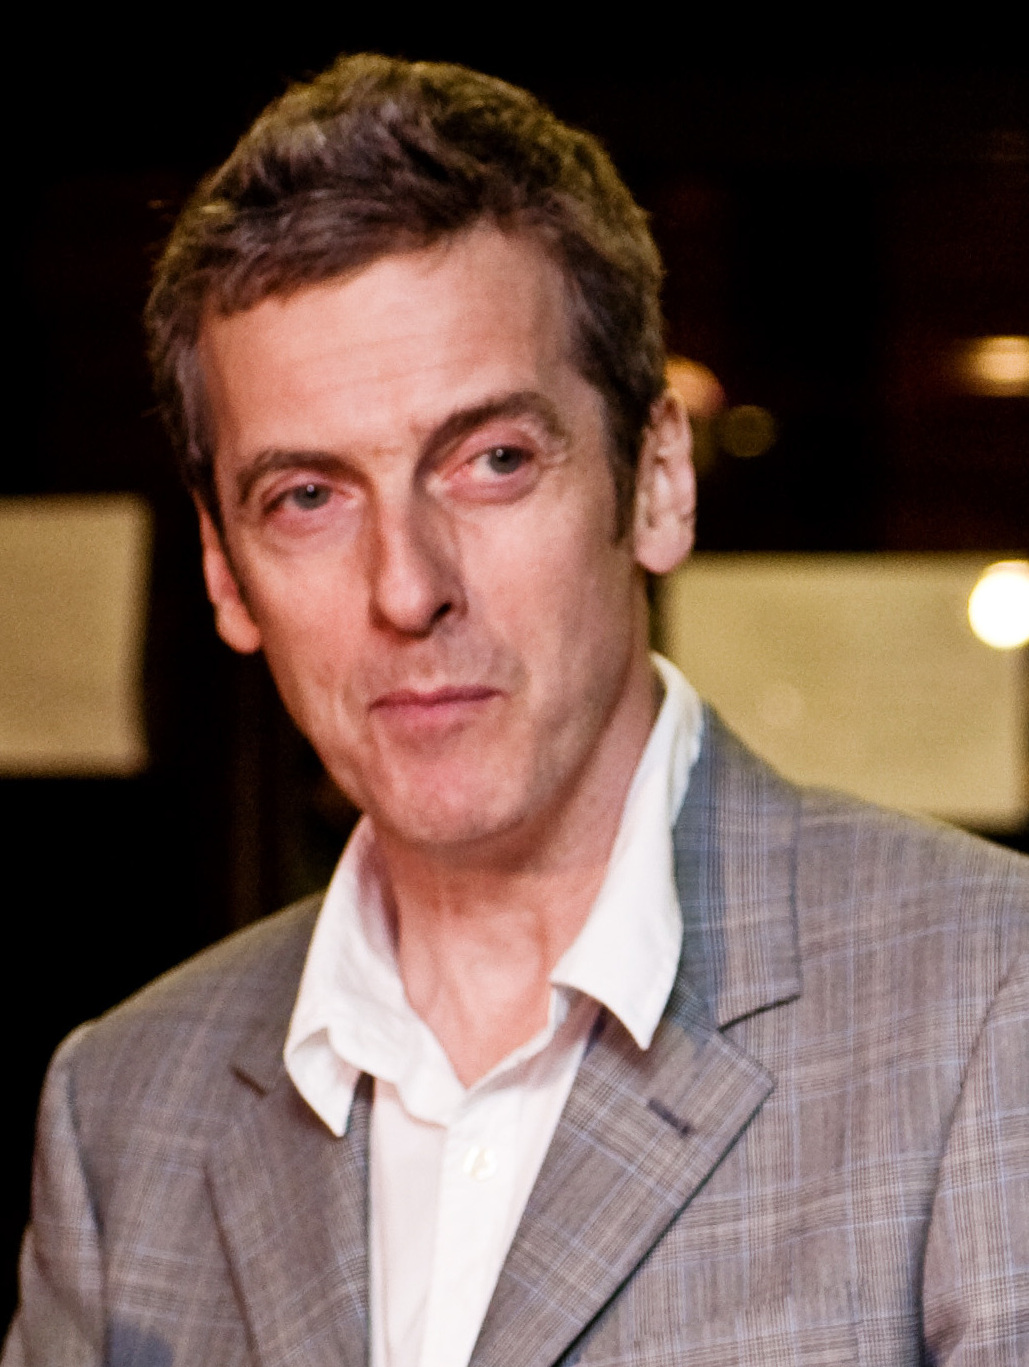 Peter Capaldi 2009 (cropped).jpg